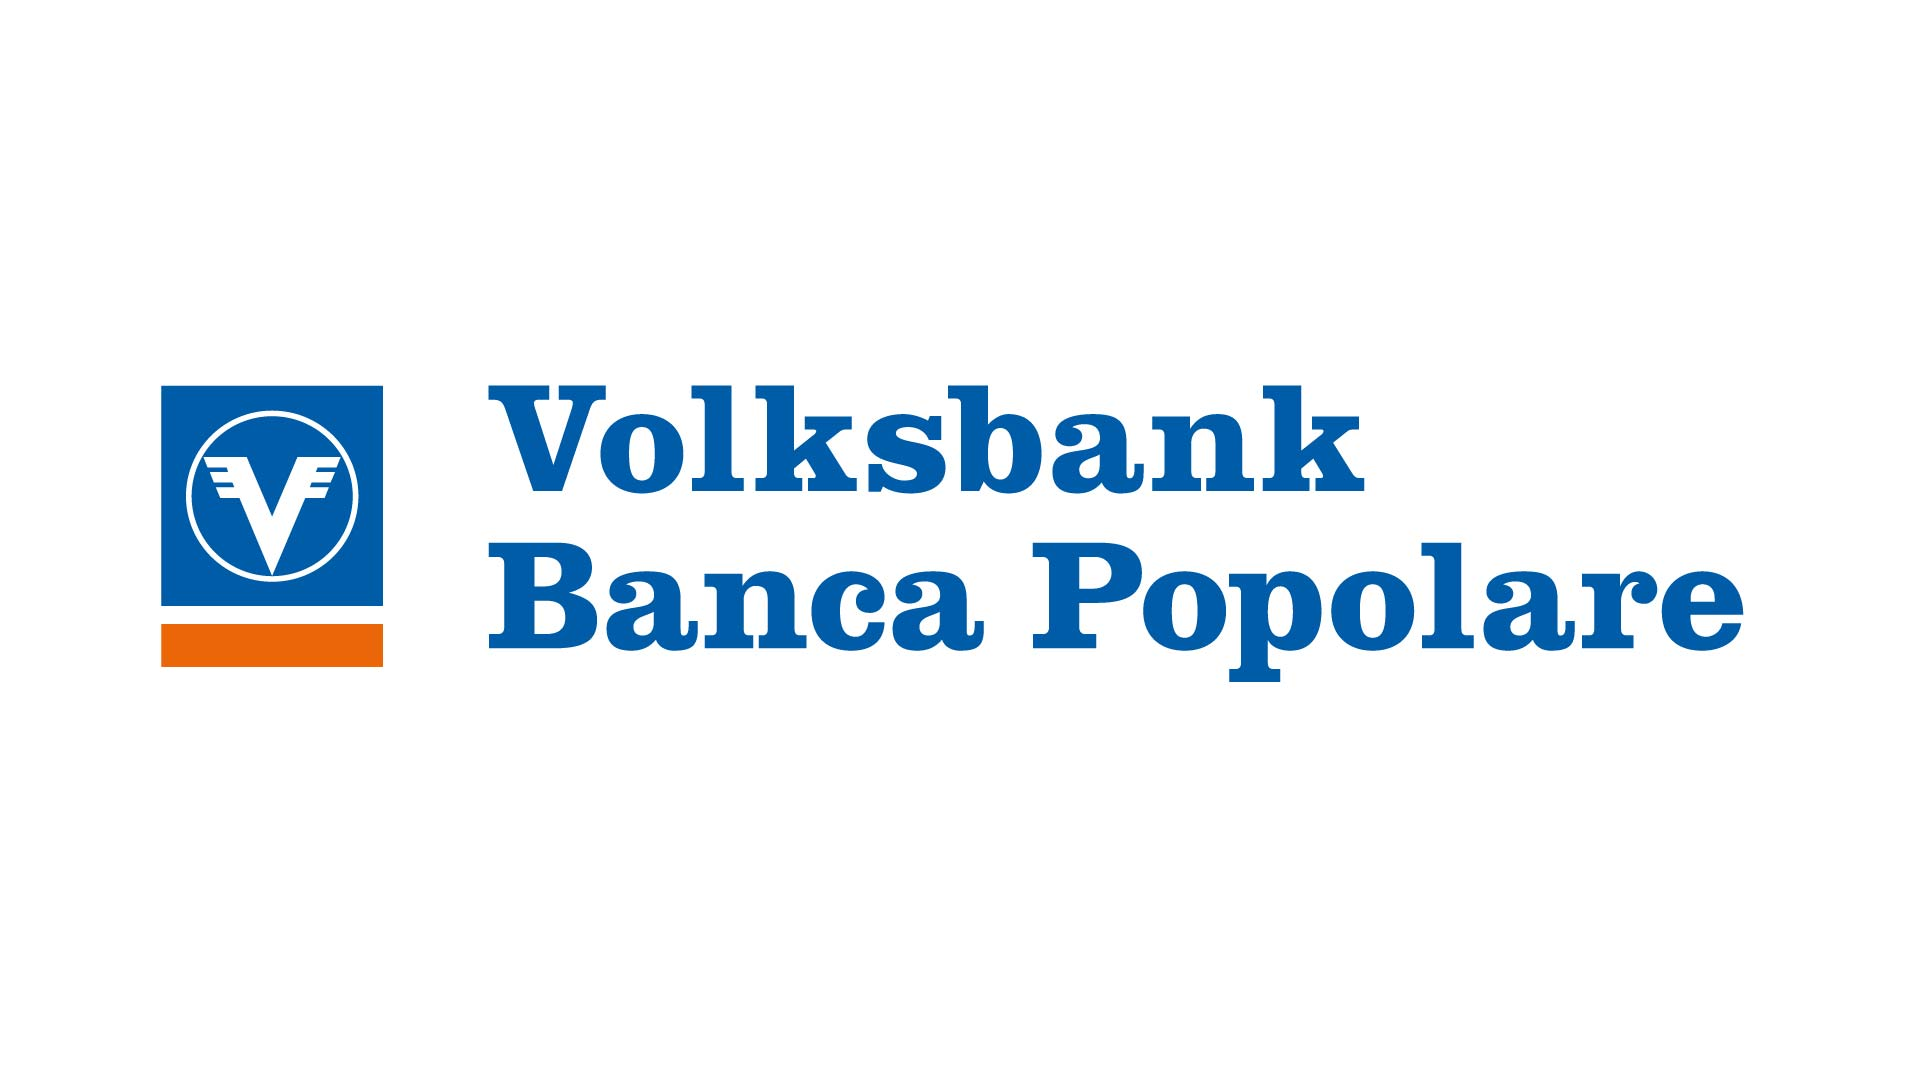 Sponsor ufficiale di Street Food Garden Volksbank Banca Popolare